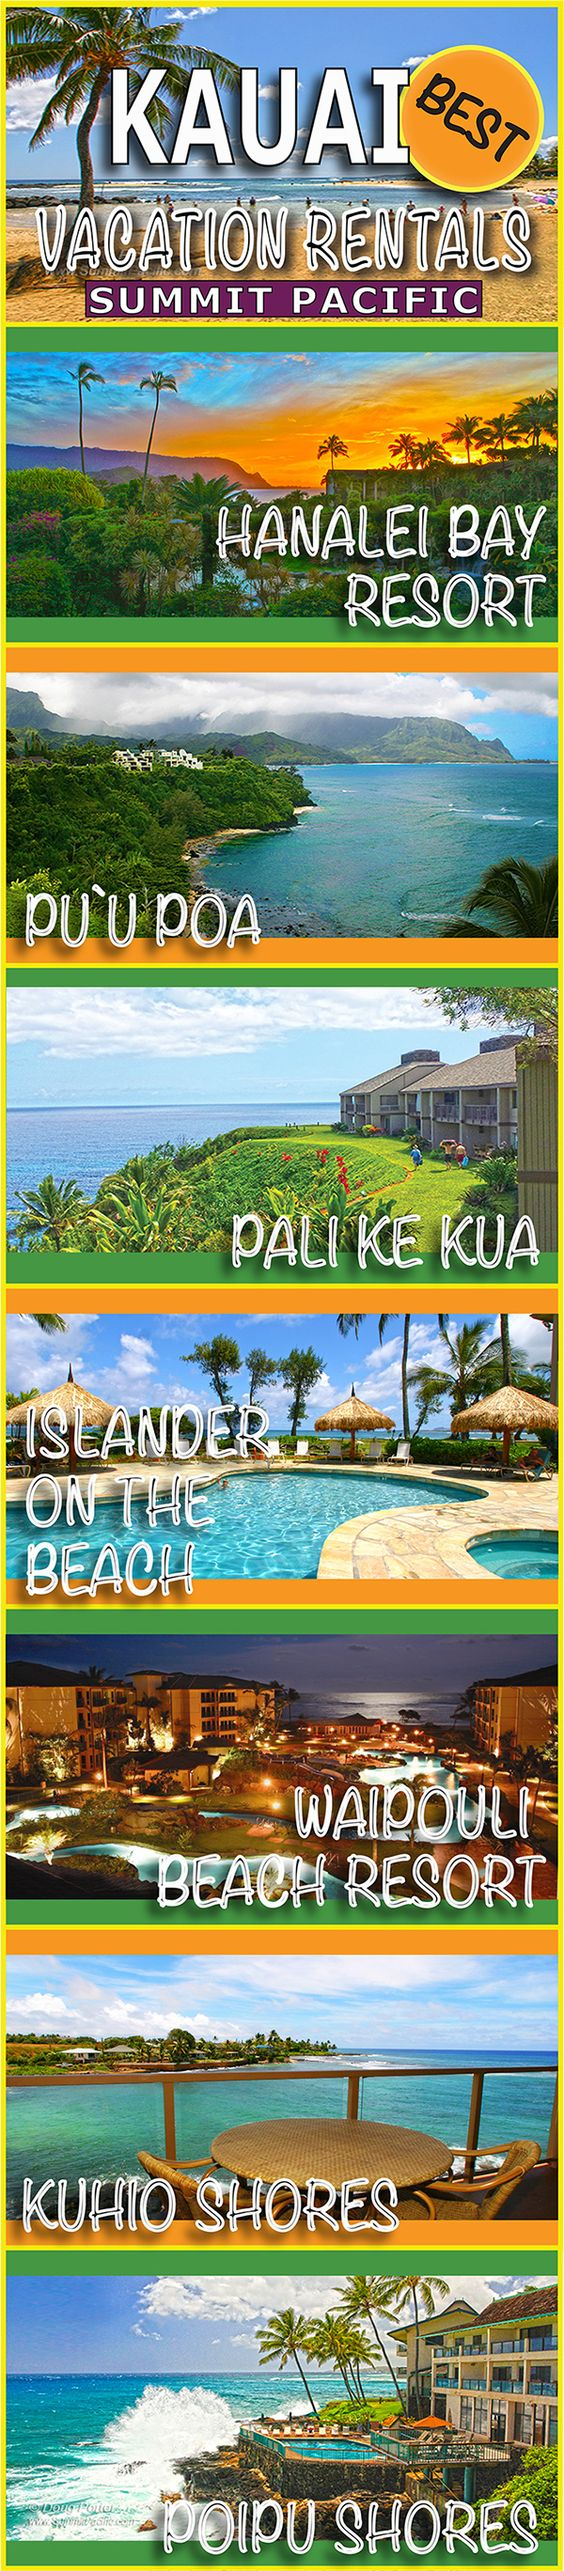 Kauai Condo Rentals #Hawaii #Kauai #Vacation